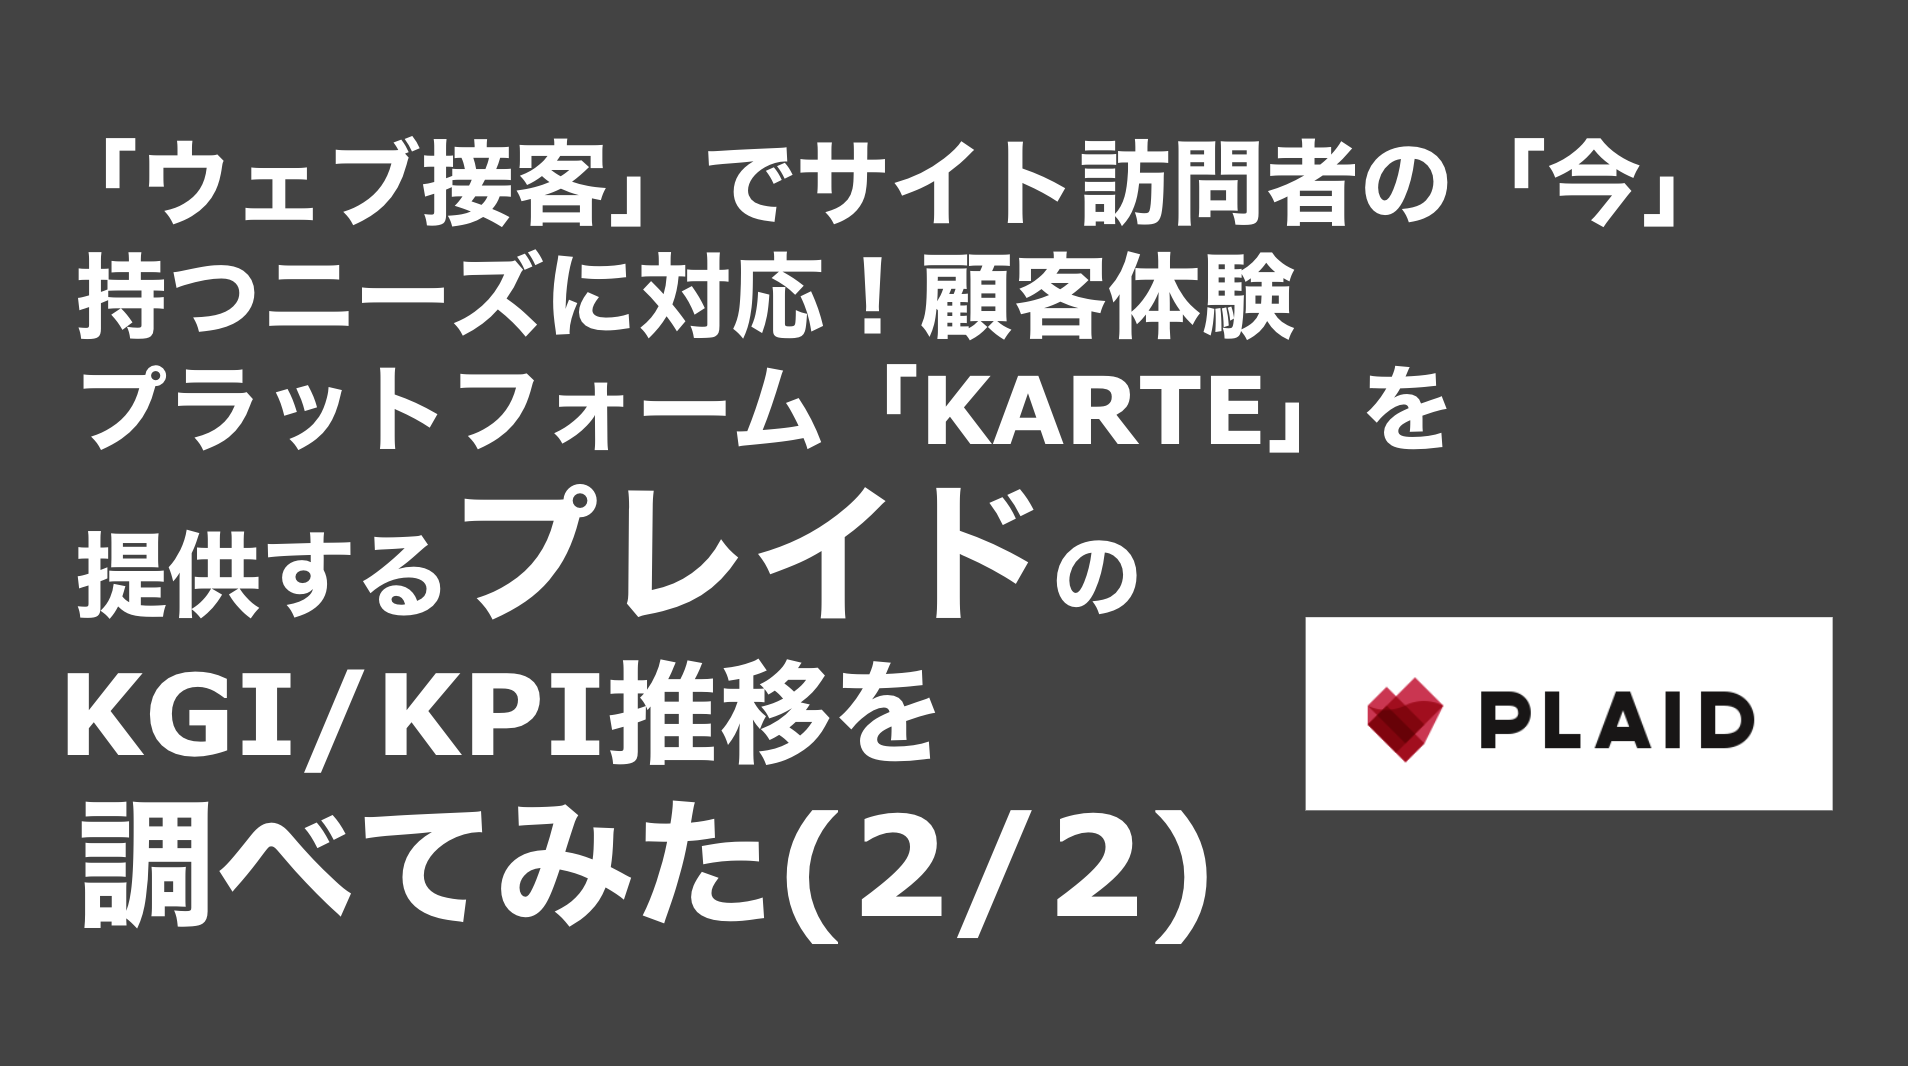 saaslife_「ウェブ接客」でサイト訪問者の「今」持つニーズに対応!顧客体験プラットフォーム「KARTE」を提供するプレイドのKGI/KPI推移を調べてみた(2/2)